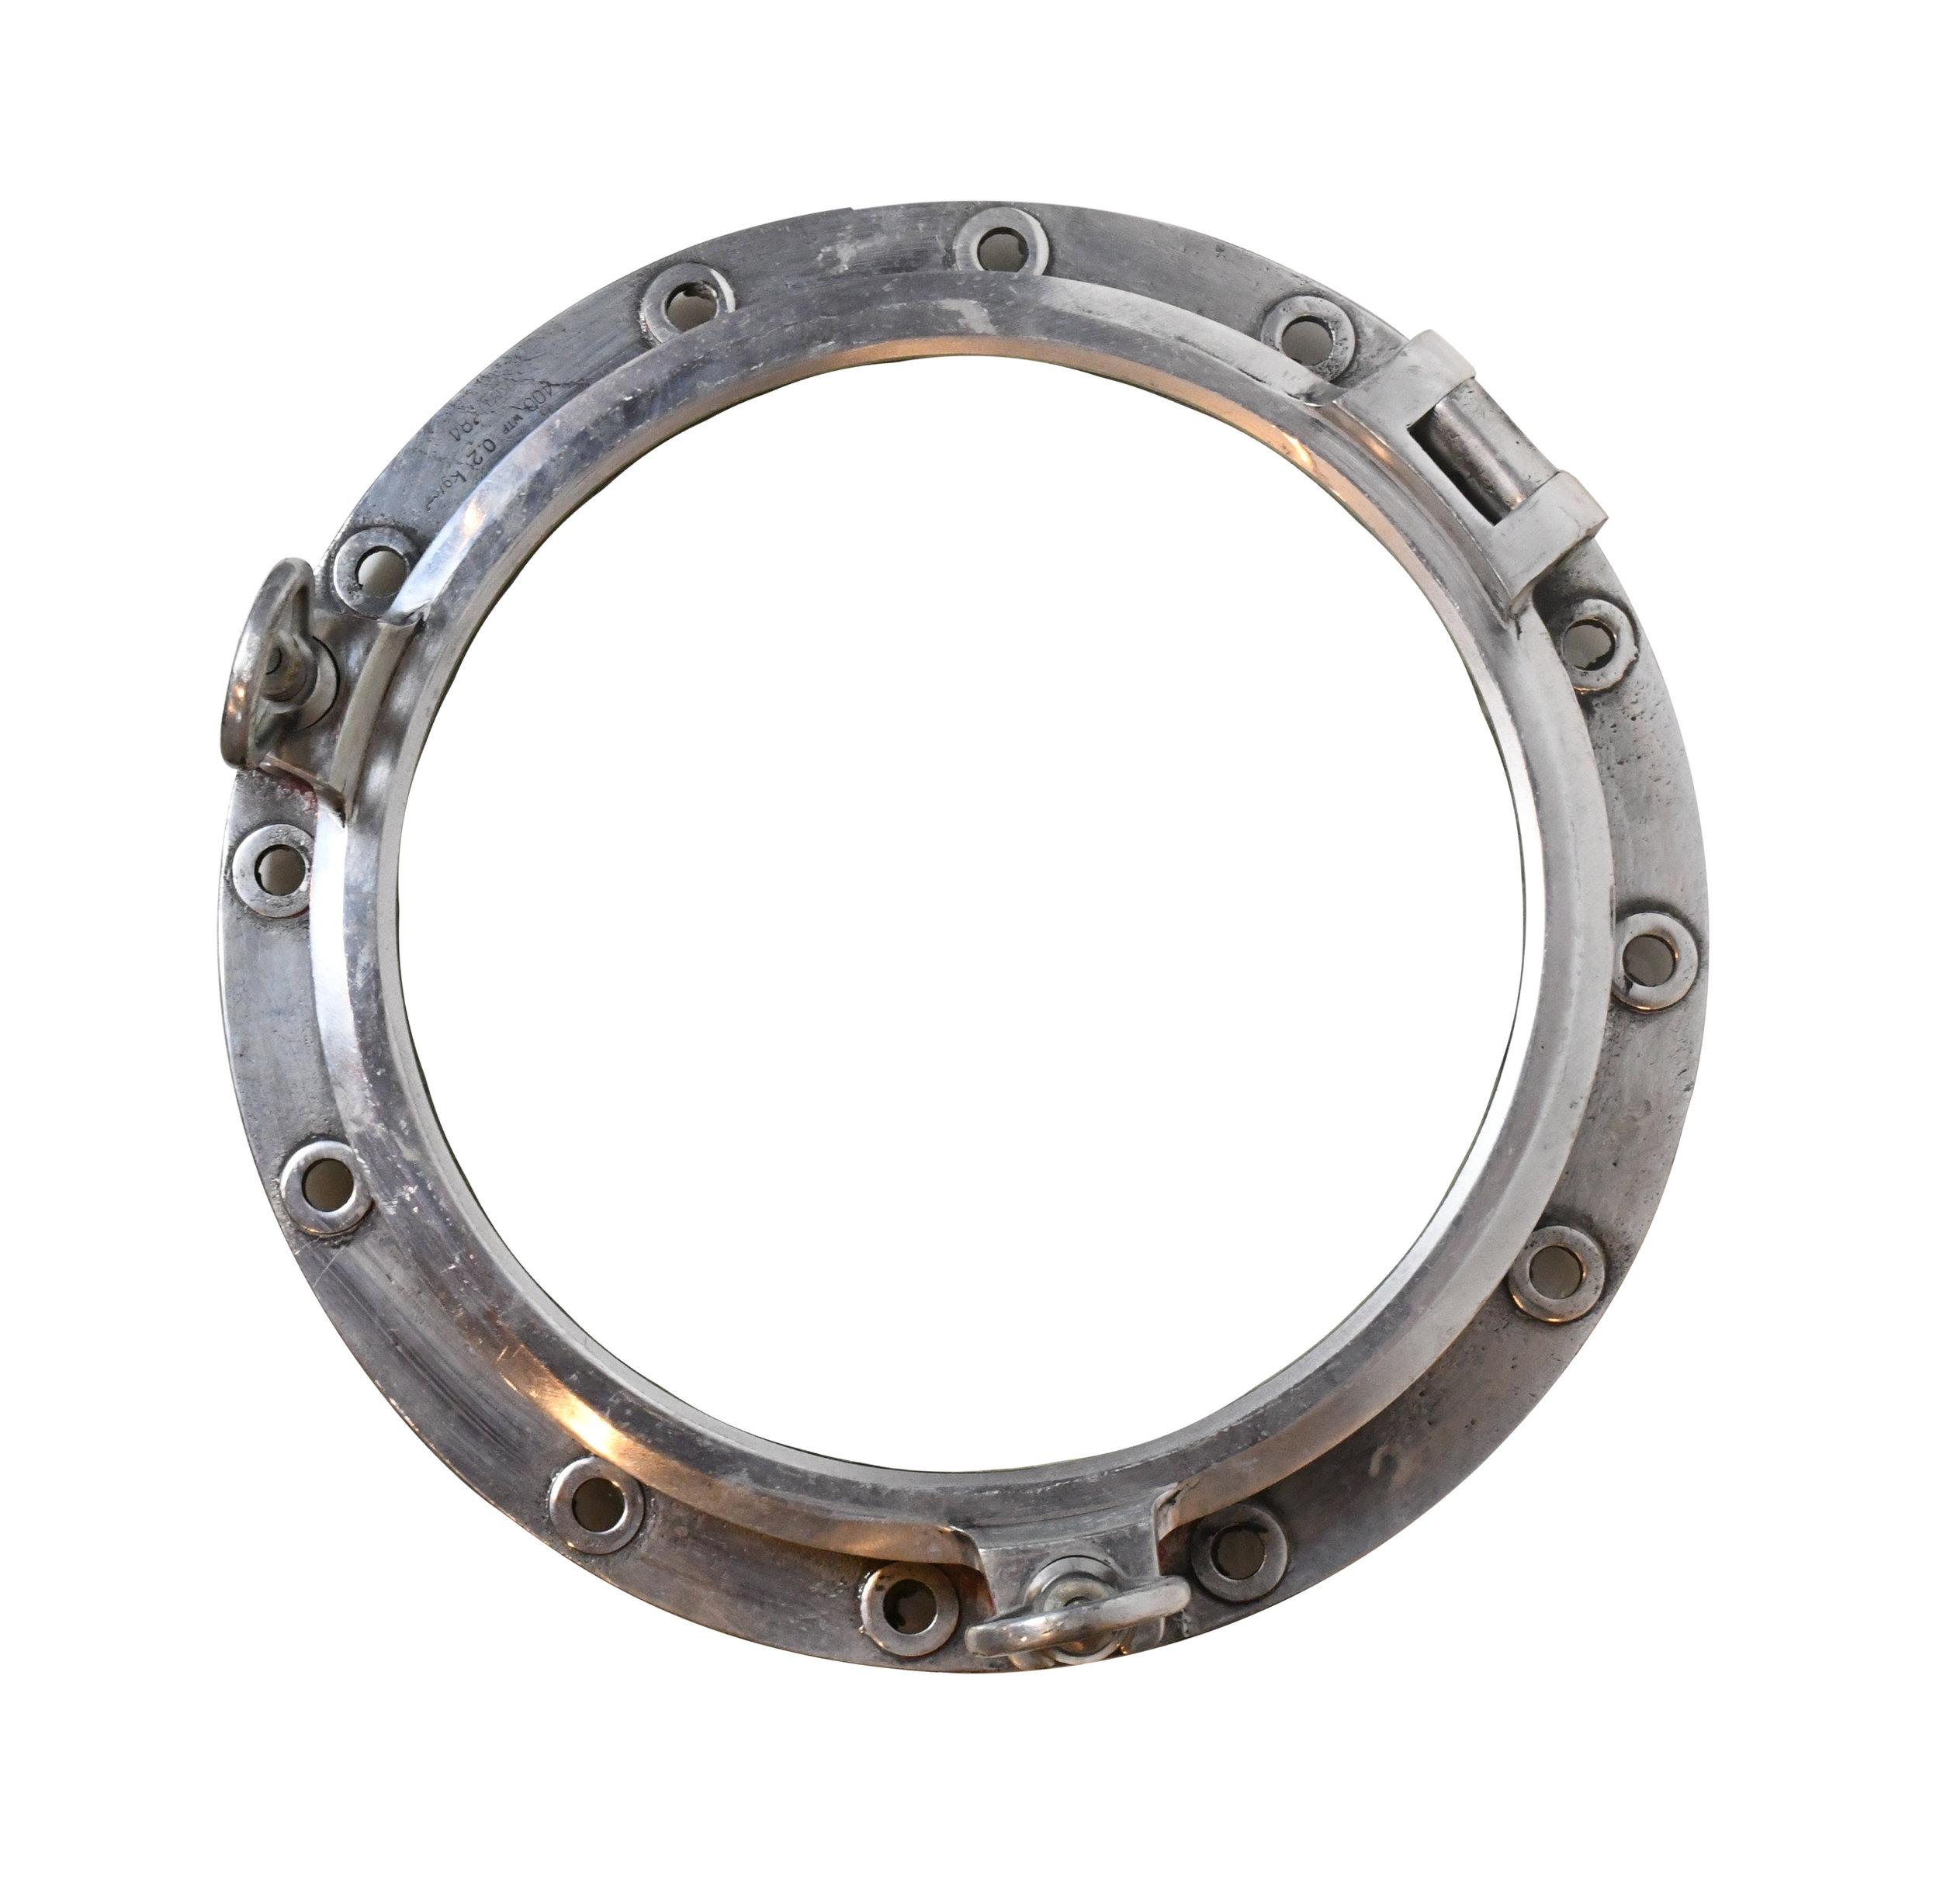 47470-porthole-nickle-plates-big-front-2.jpg